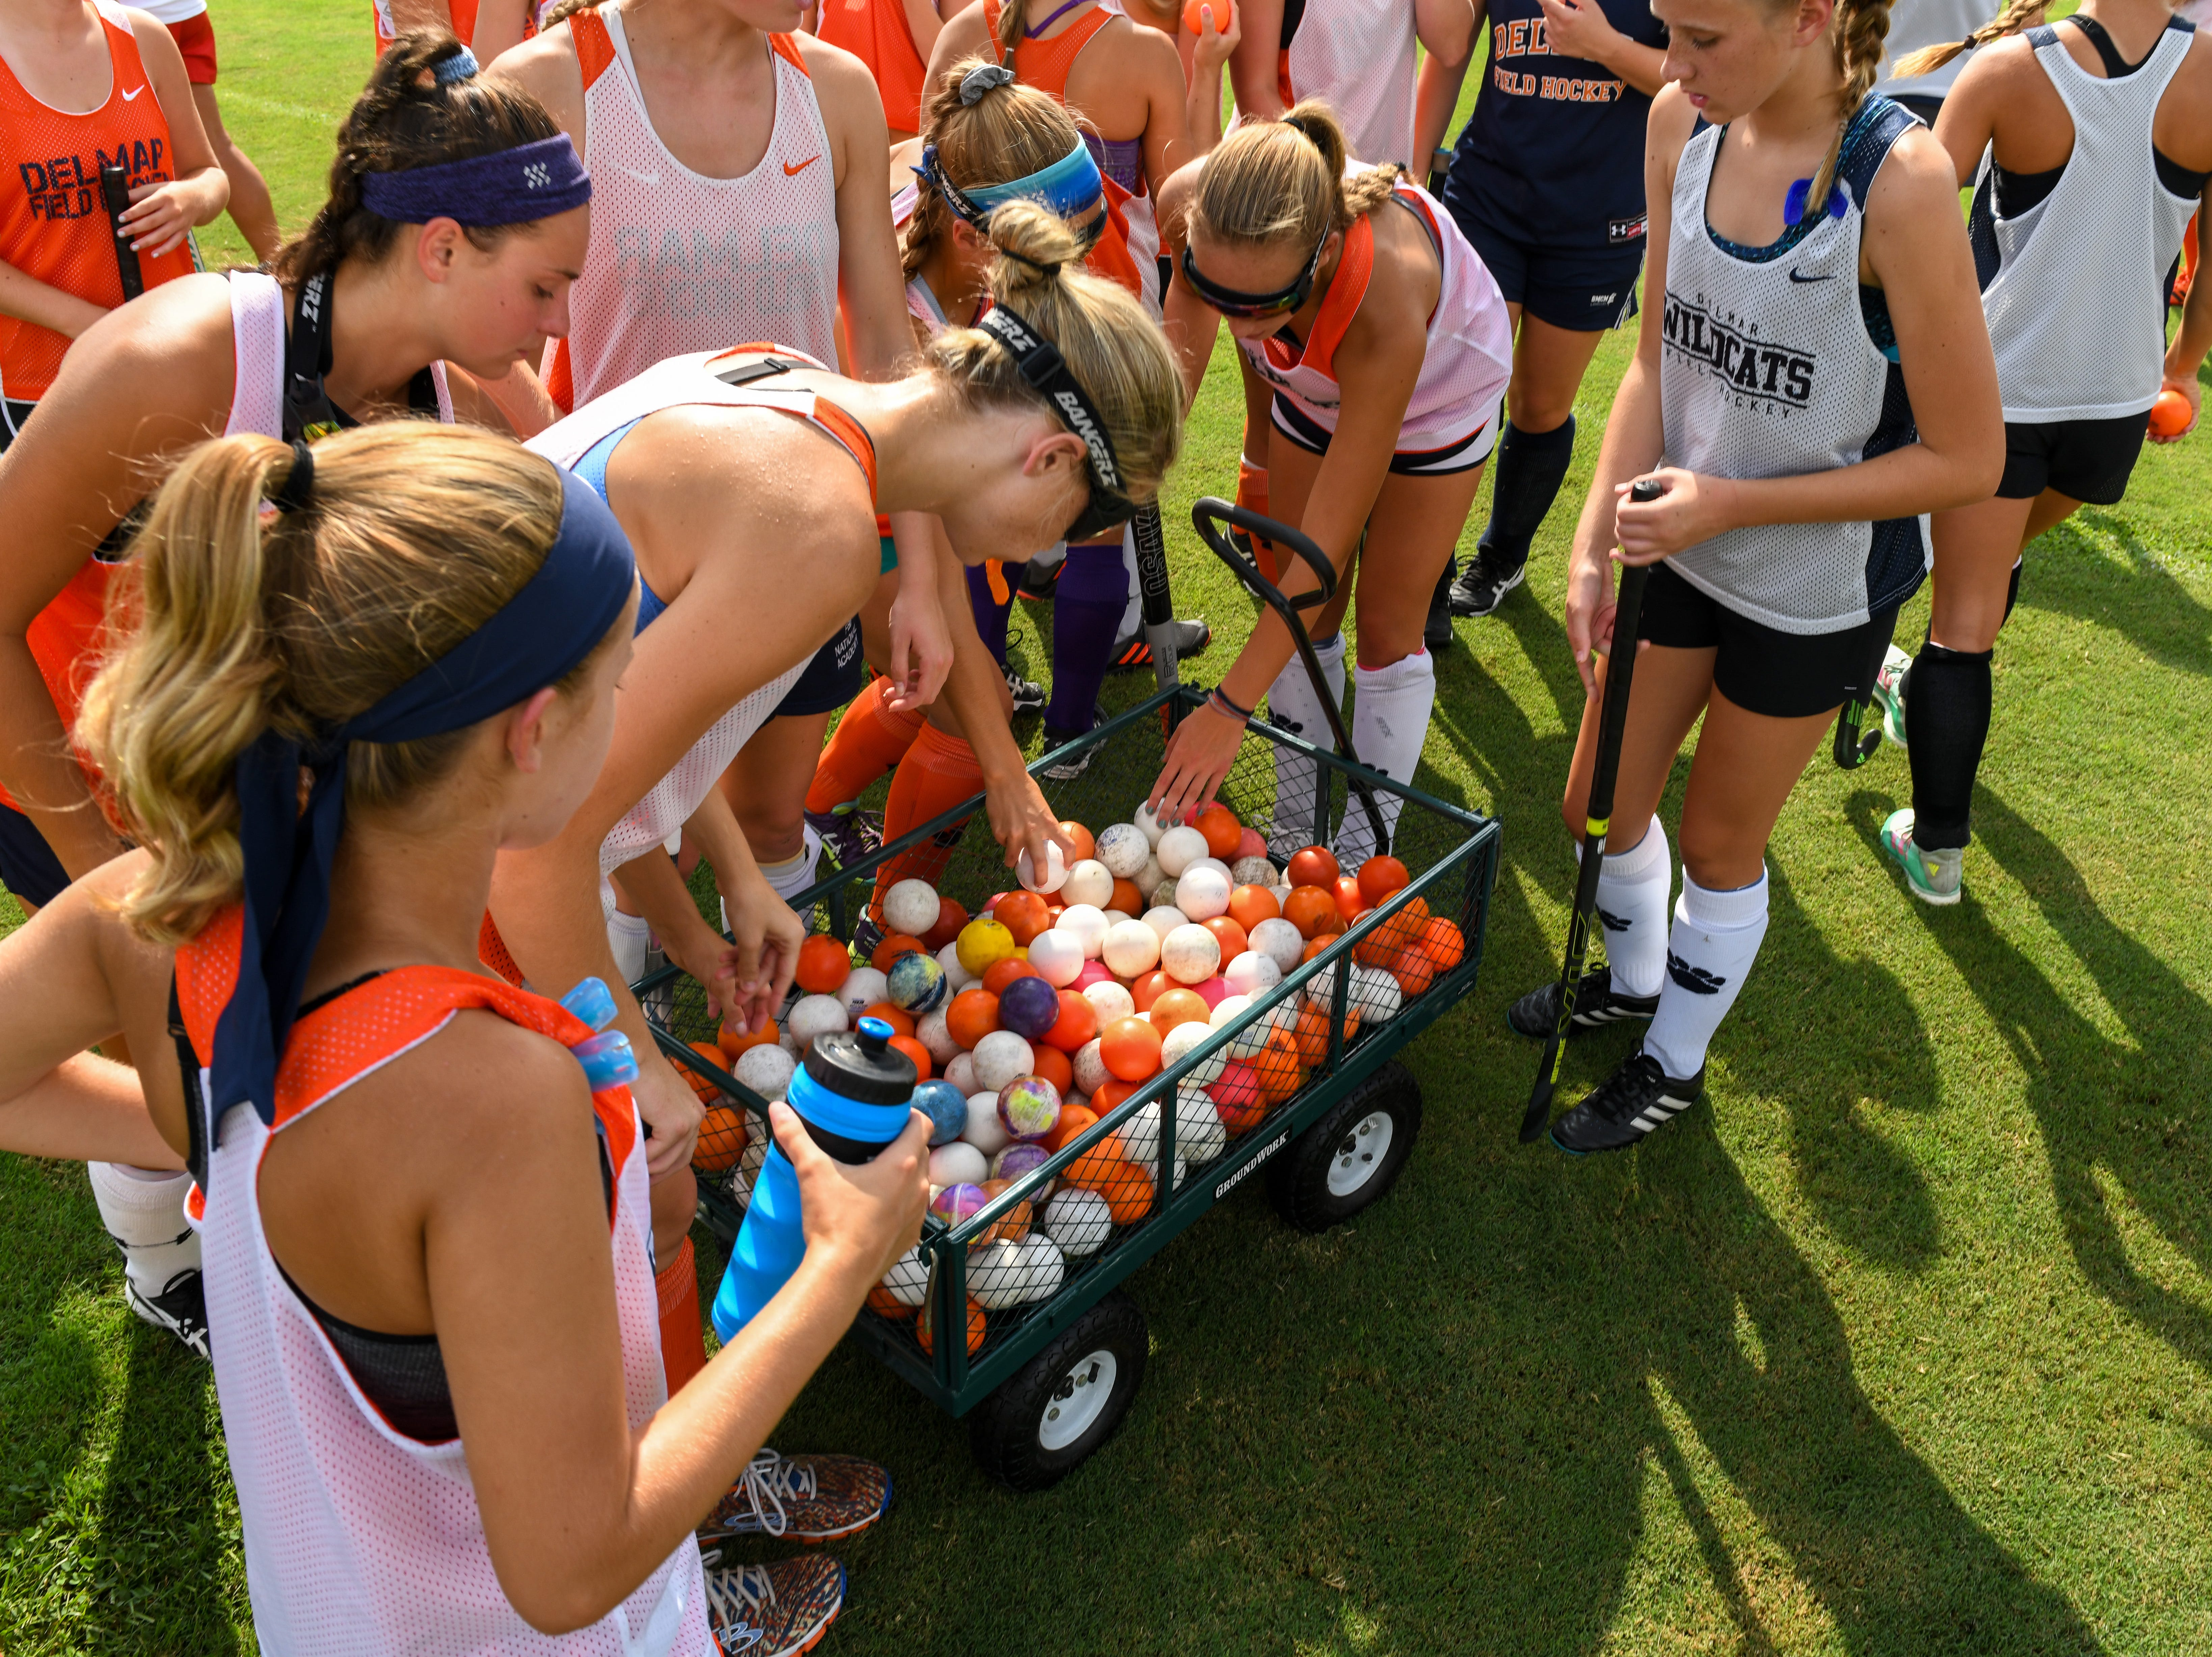 The Delmar field hockey team grabs balls before running drills at practice on Wednesday, Sept. 5.